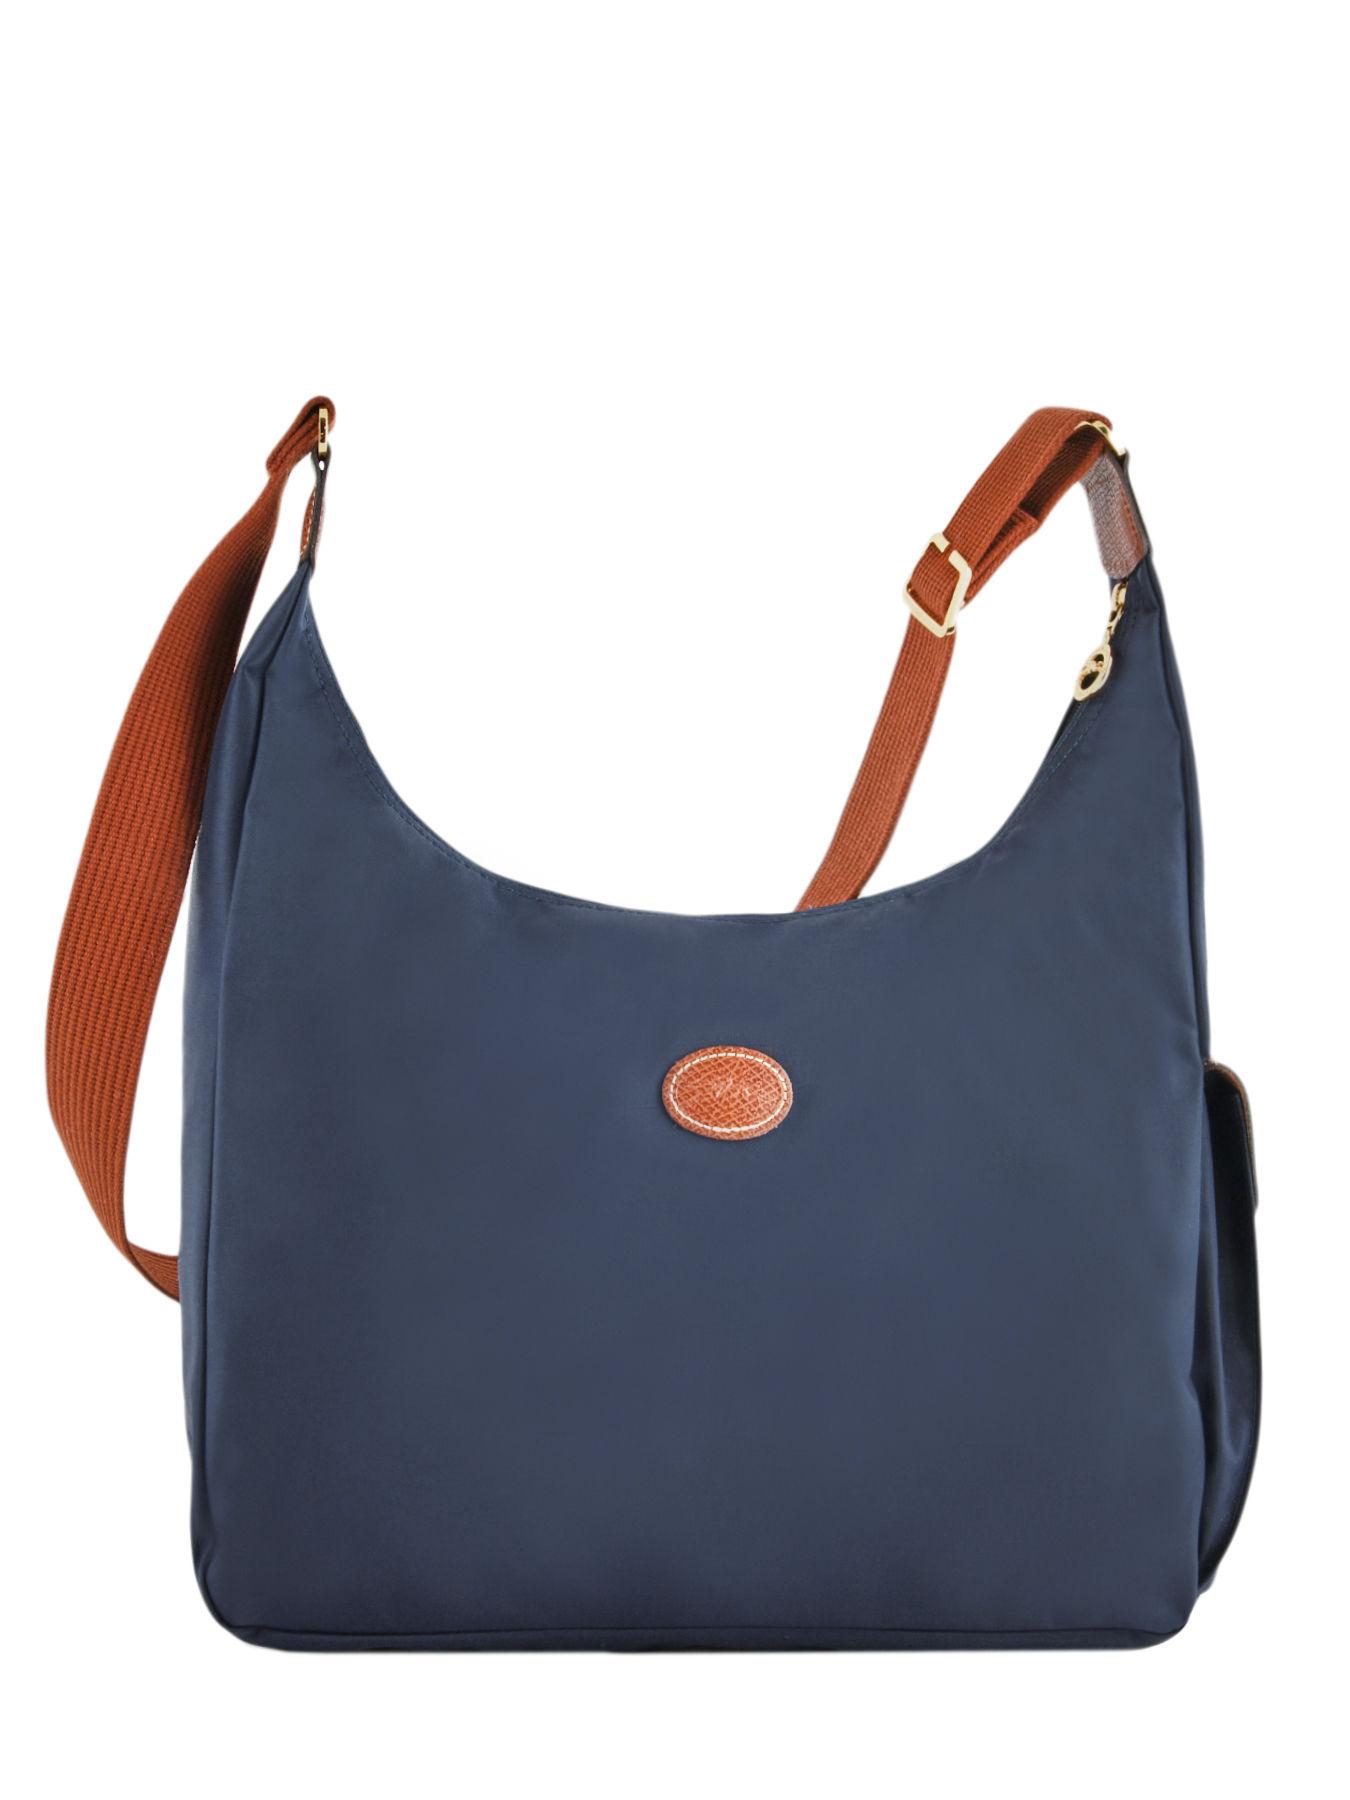 Shopping > longchamp sac porté travers, Up to 79% OFF